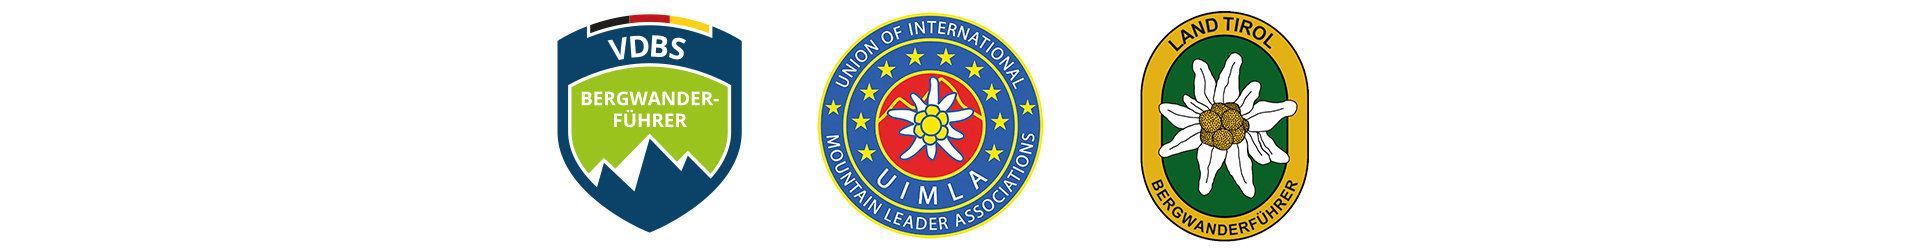 logo-leiste-bergwanderfuehrer.png